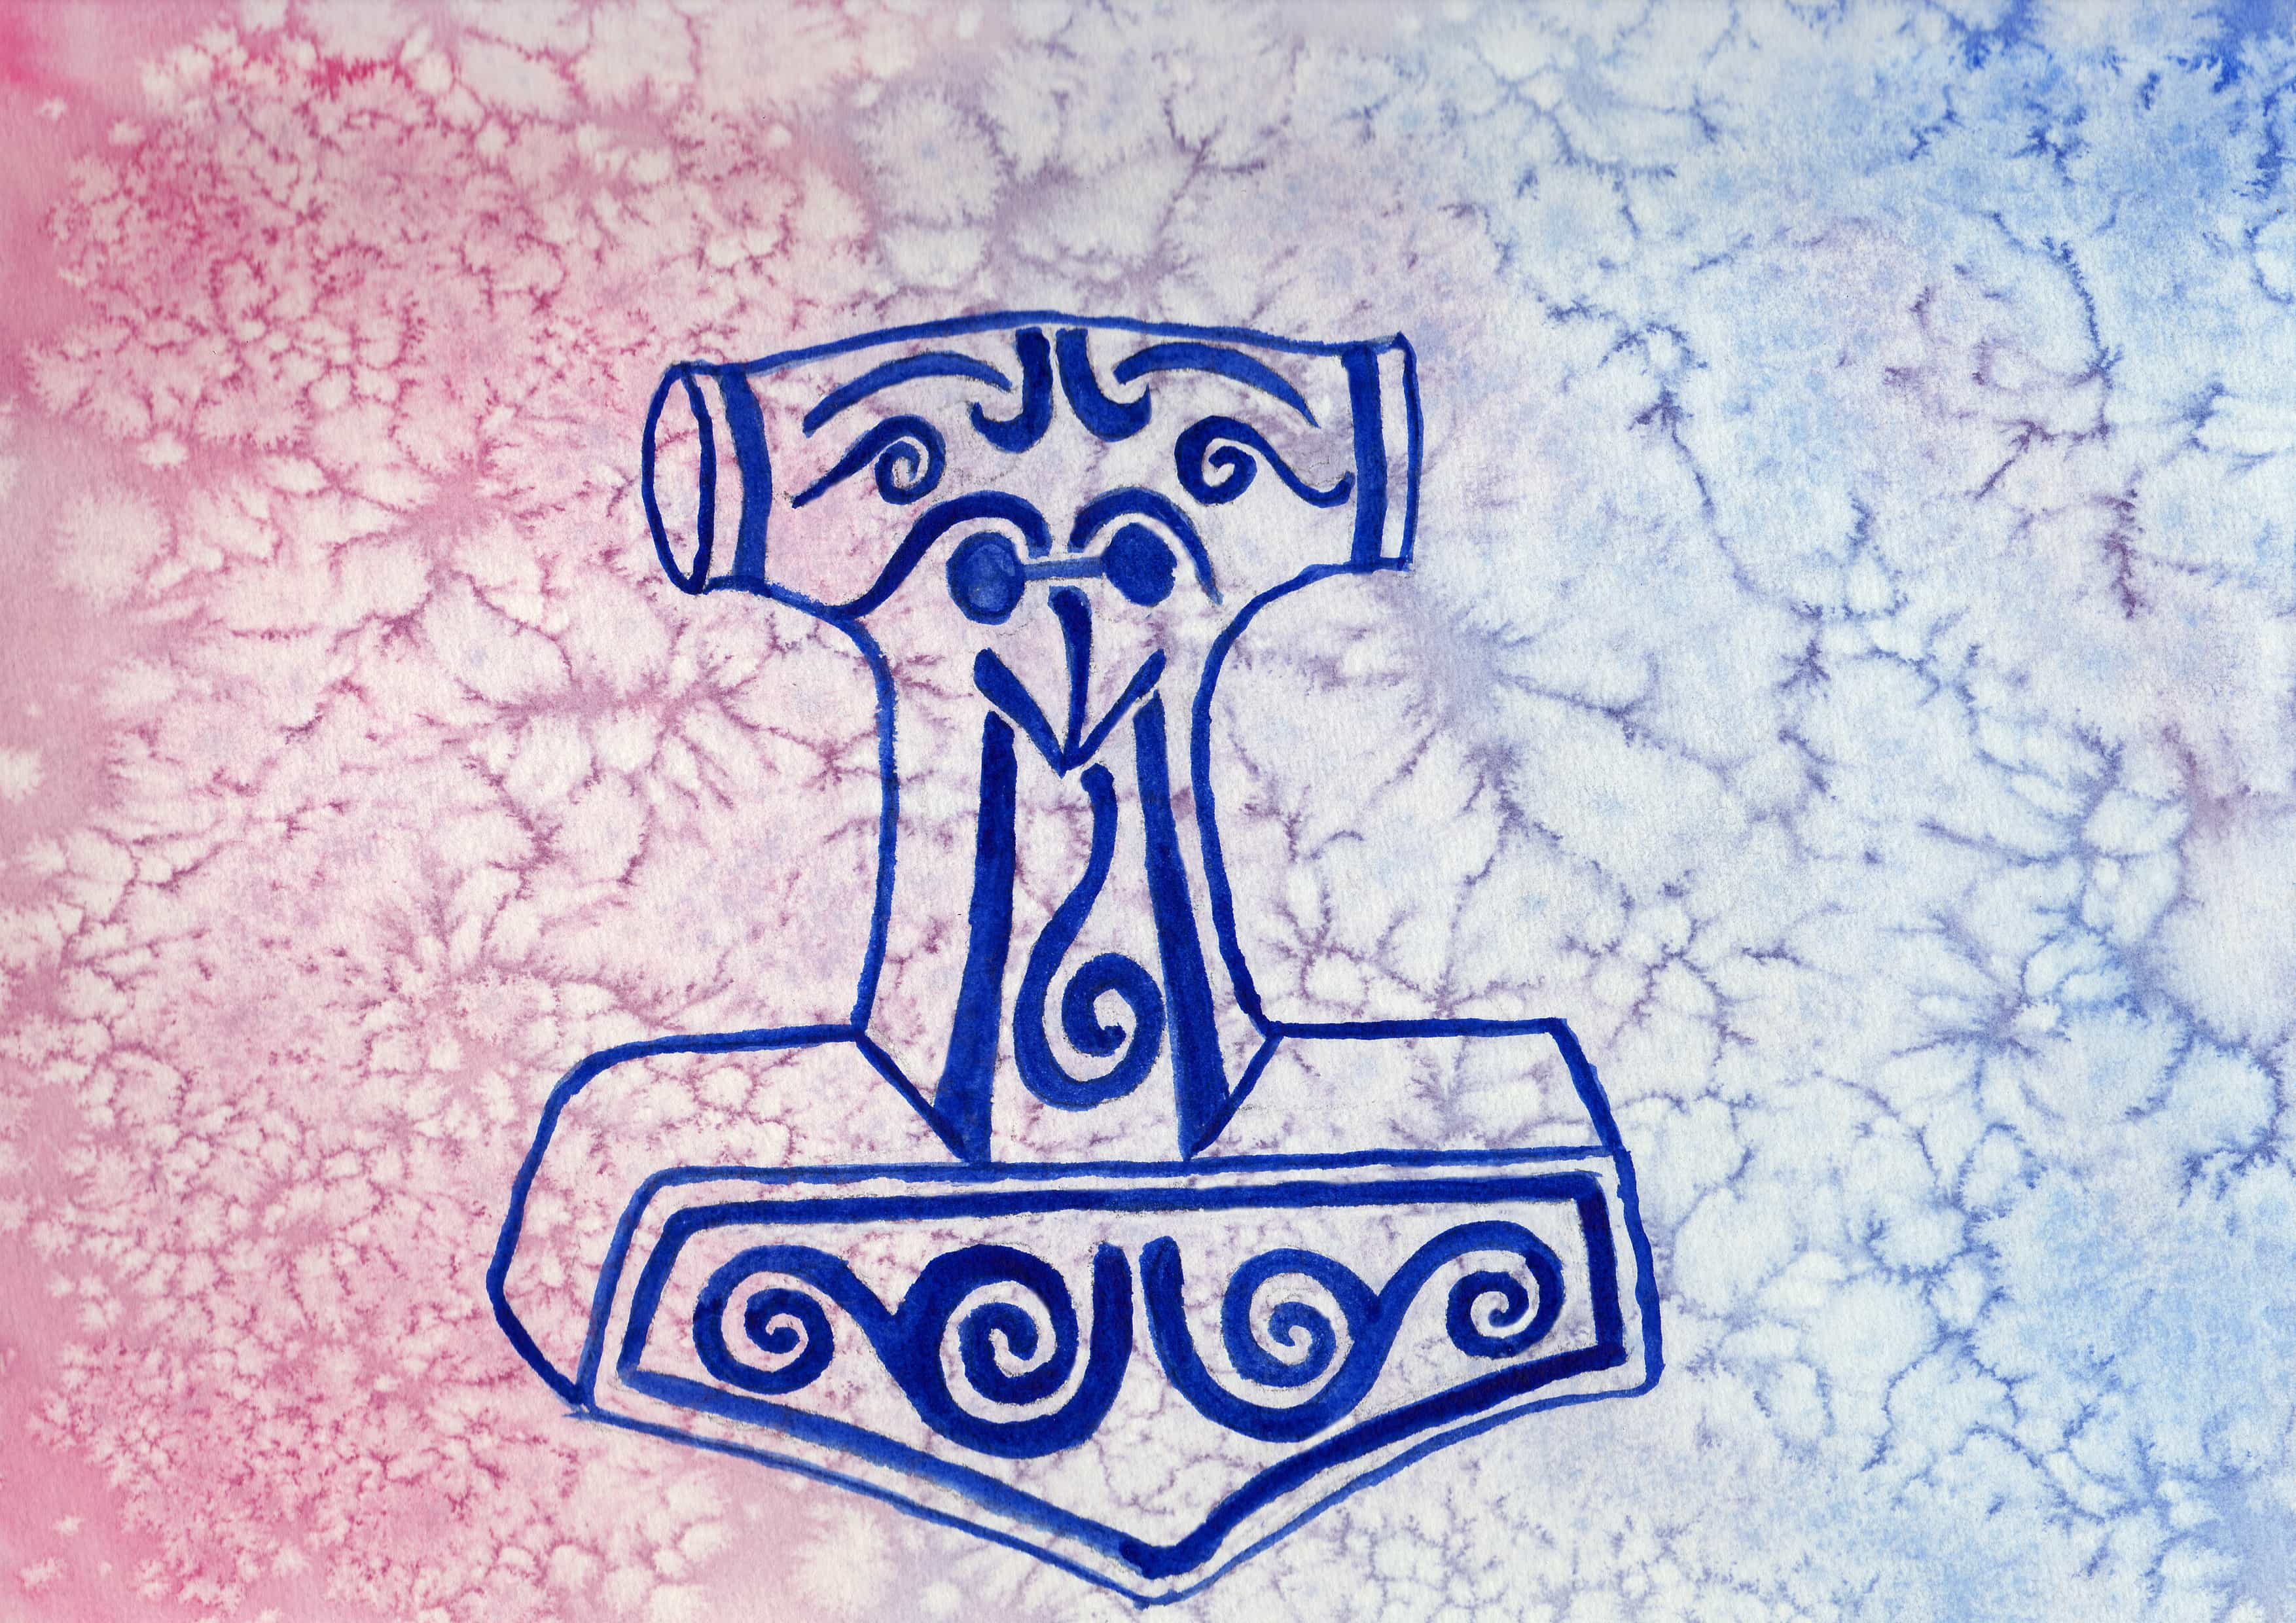 100 Hellige Symboler - Tors Hammer